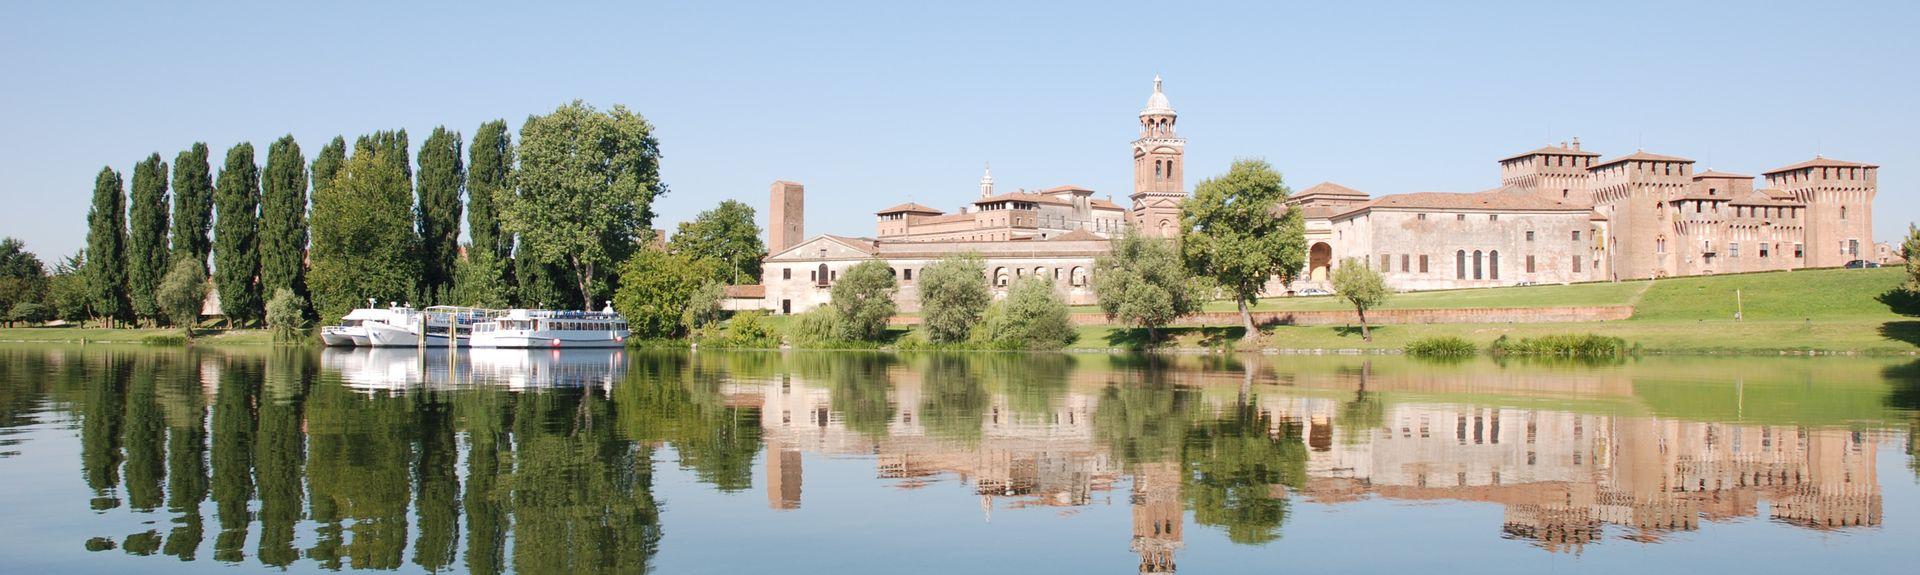 Salus Hospital, Reggio nell'Emilia, Italy